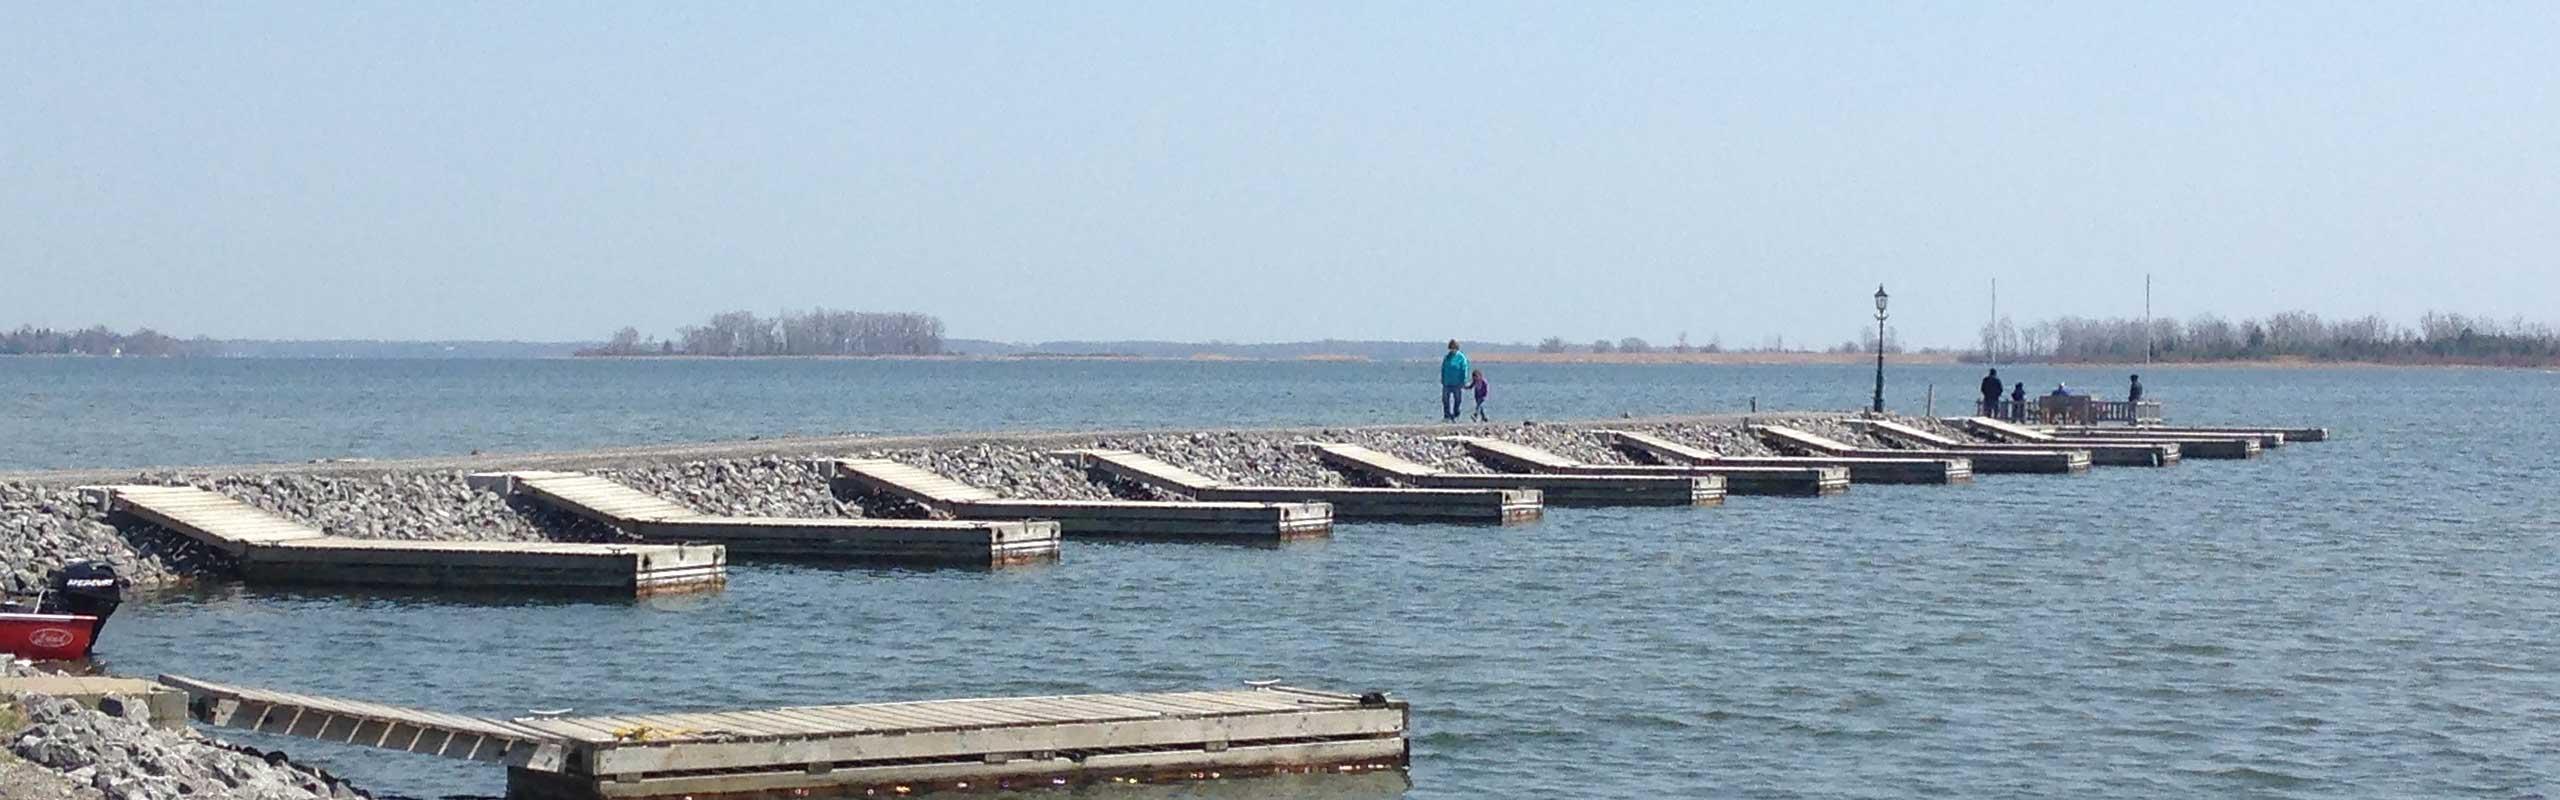 Boat-Pier-crop.jpg